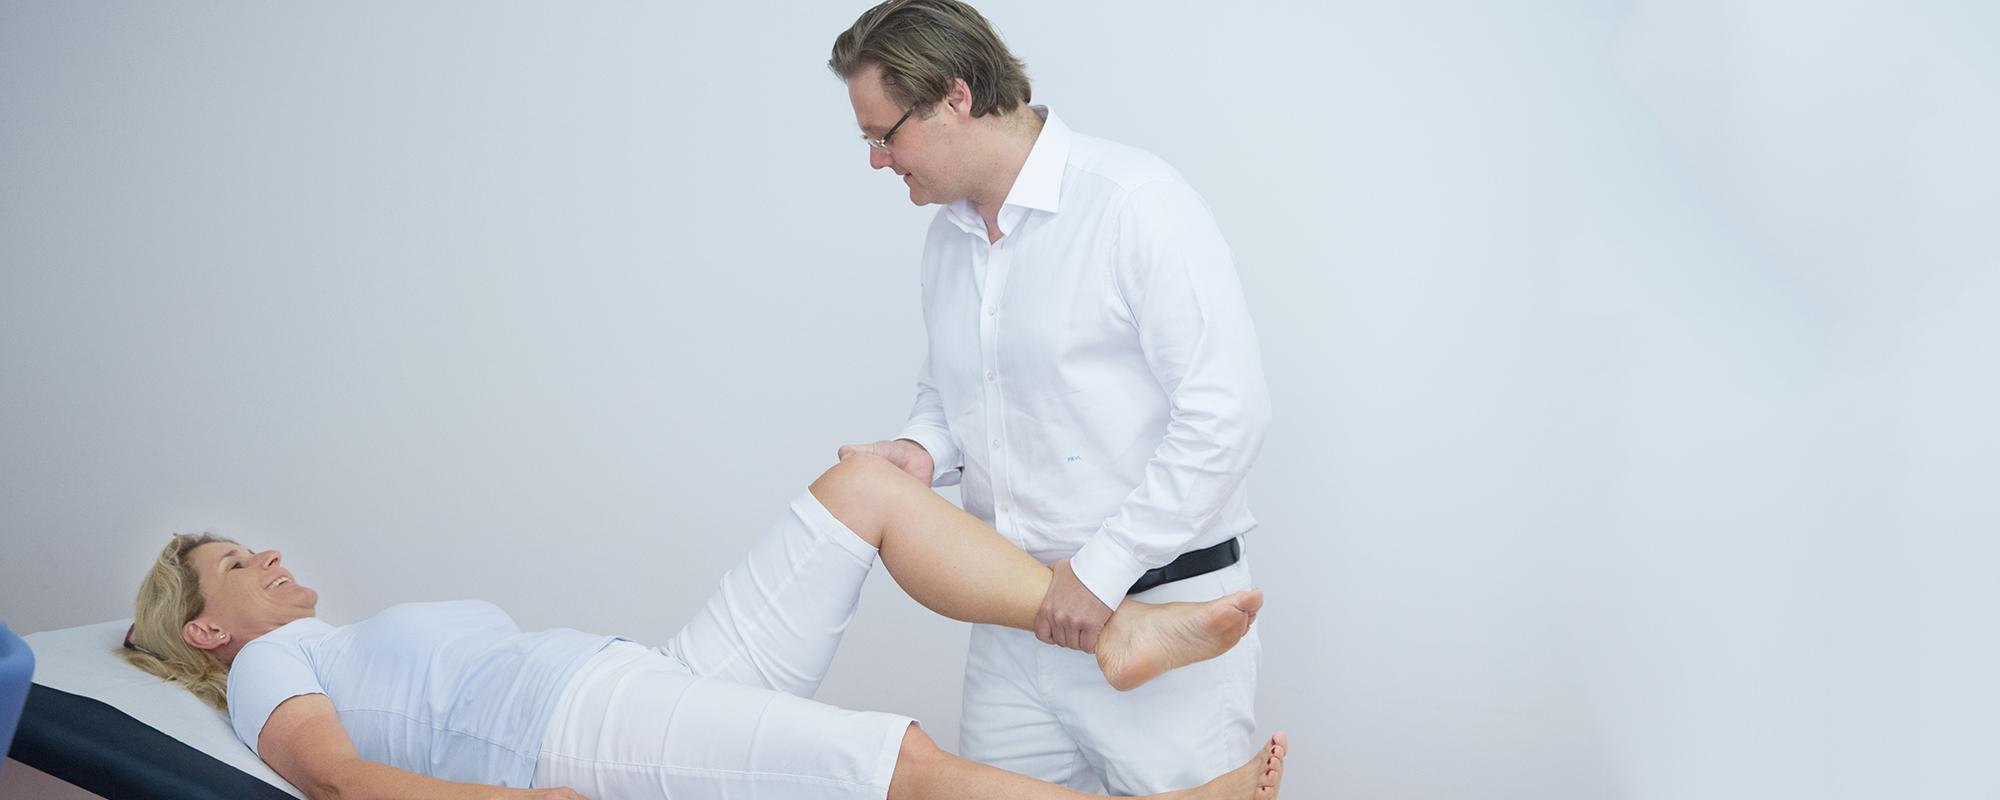 [Gelenkchirurgie]<span>[Wissenschaft & Forschung]</span>[Alternativen]